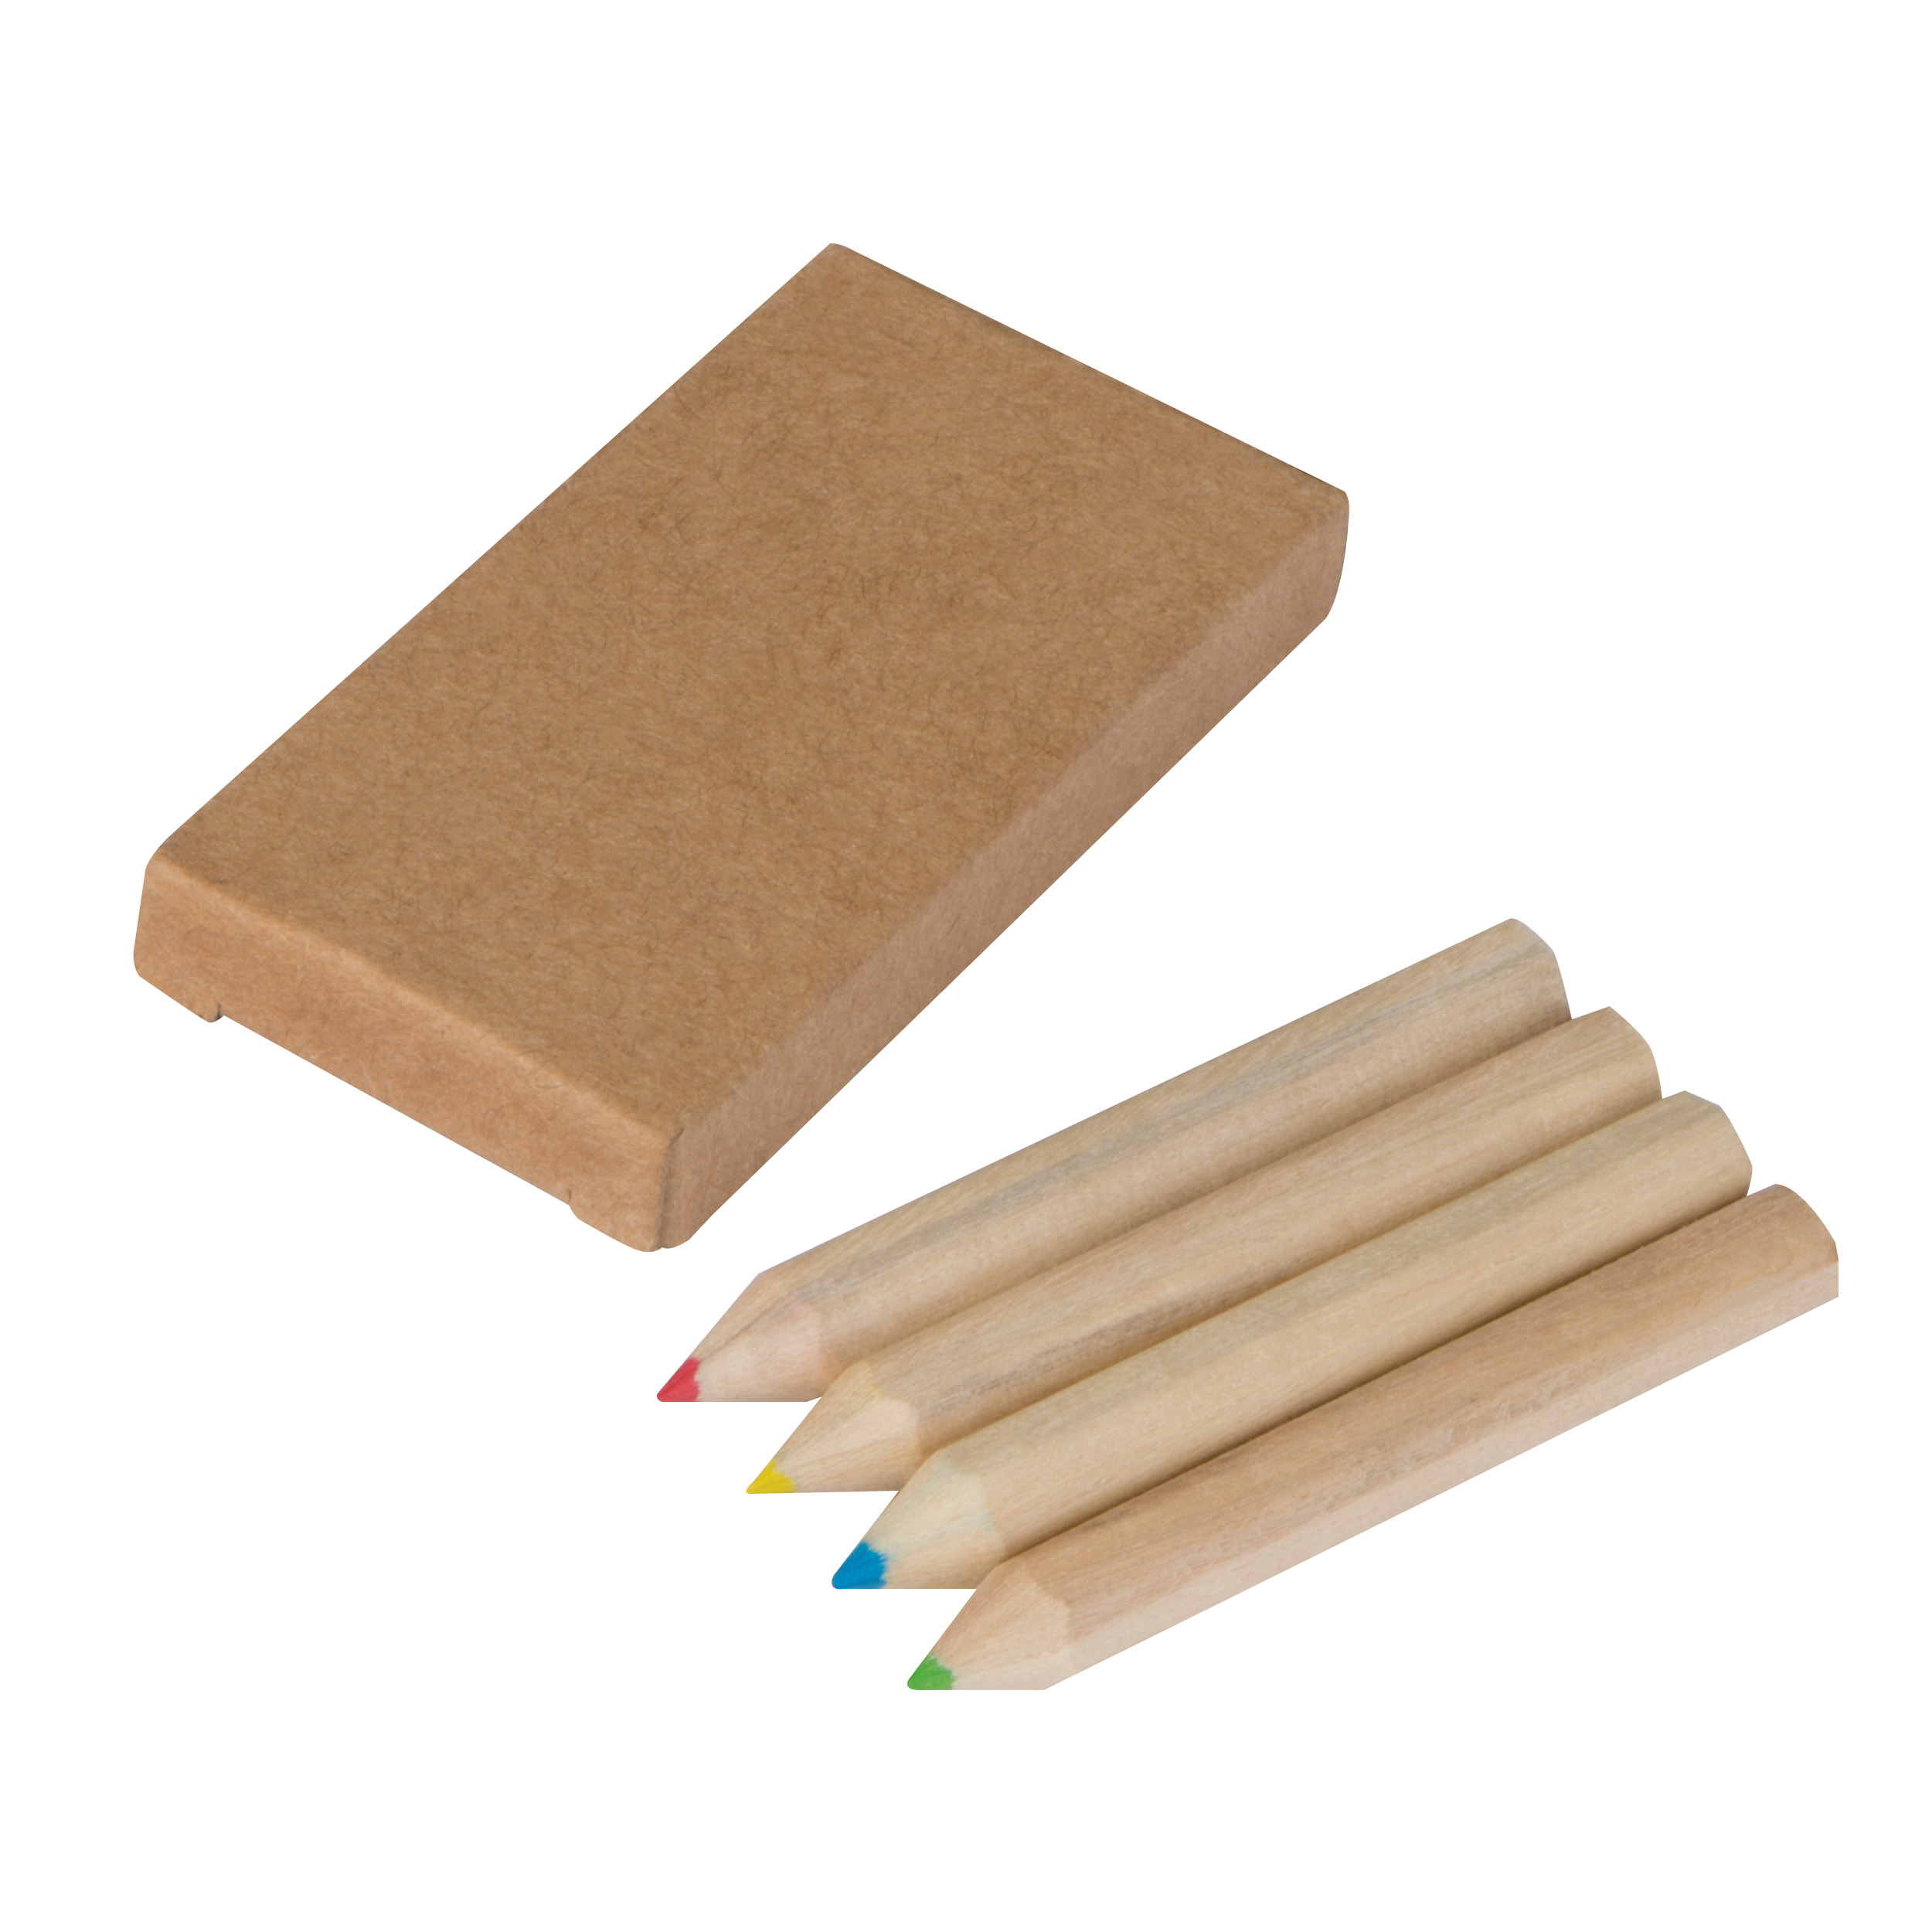 4 colouring pencils set